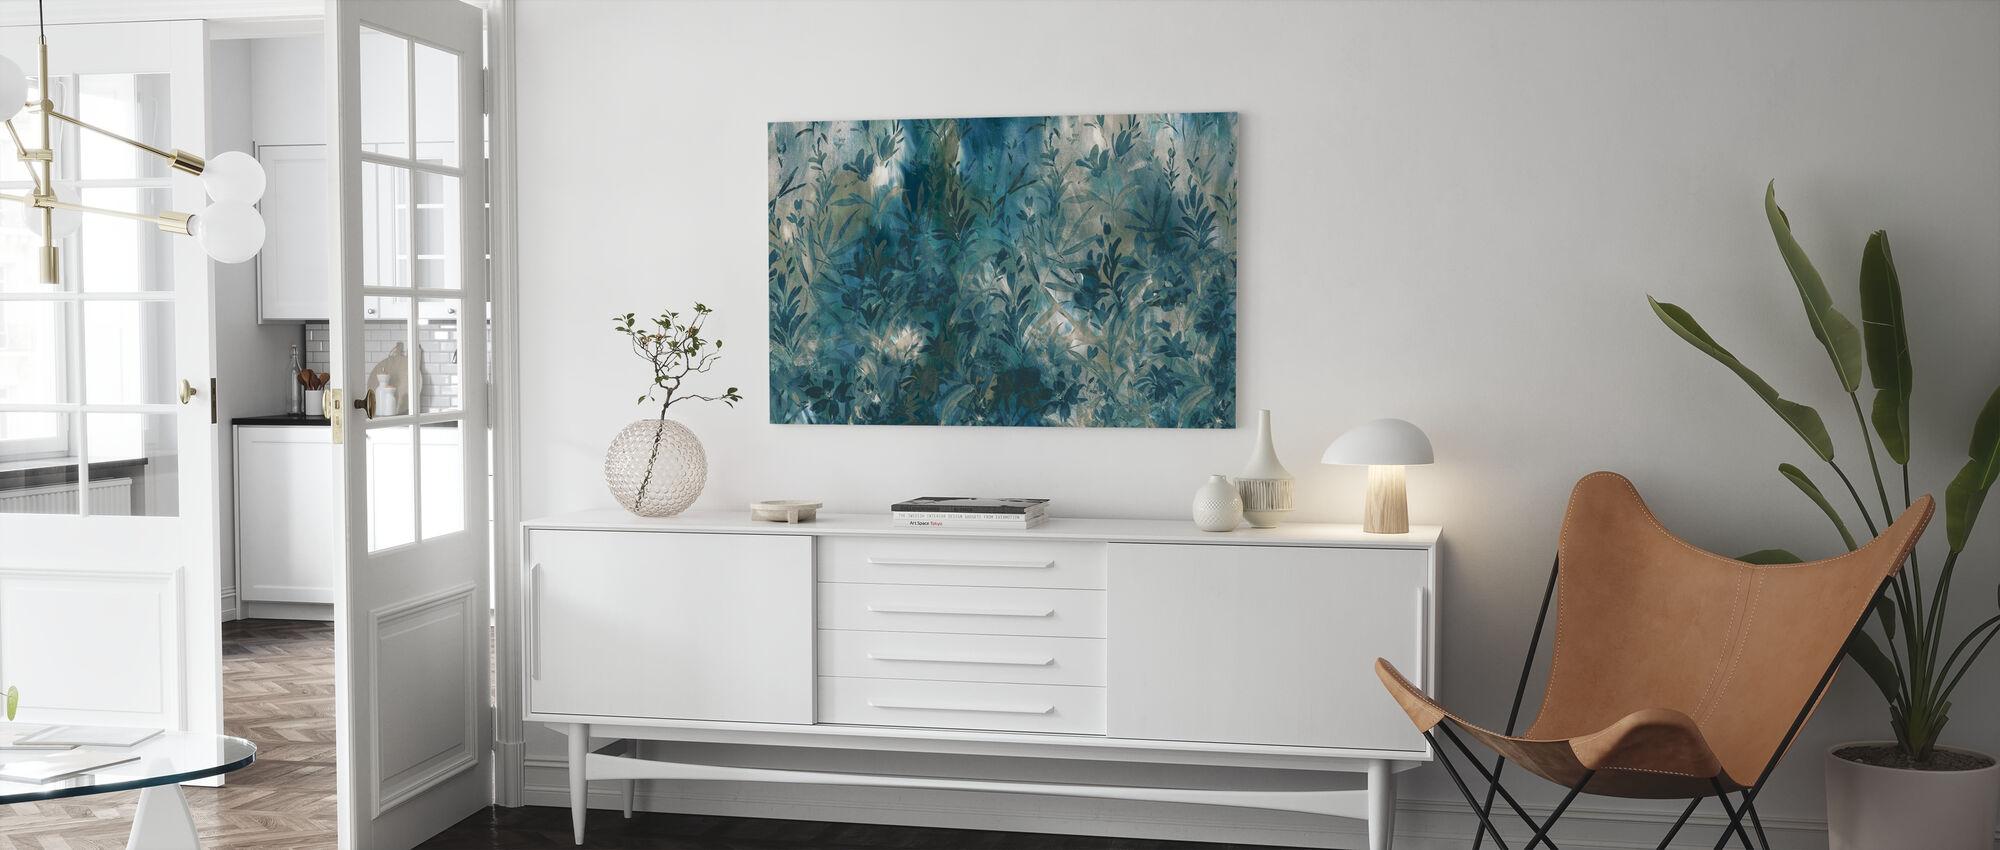 Herbage - Canvas print - Living Room